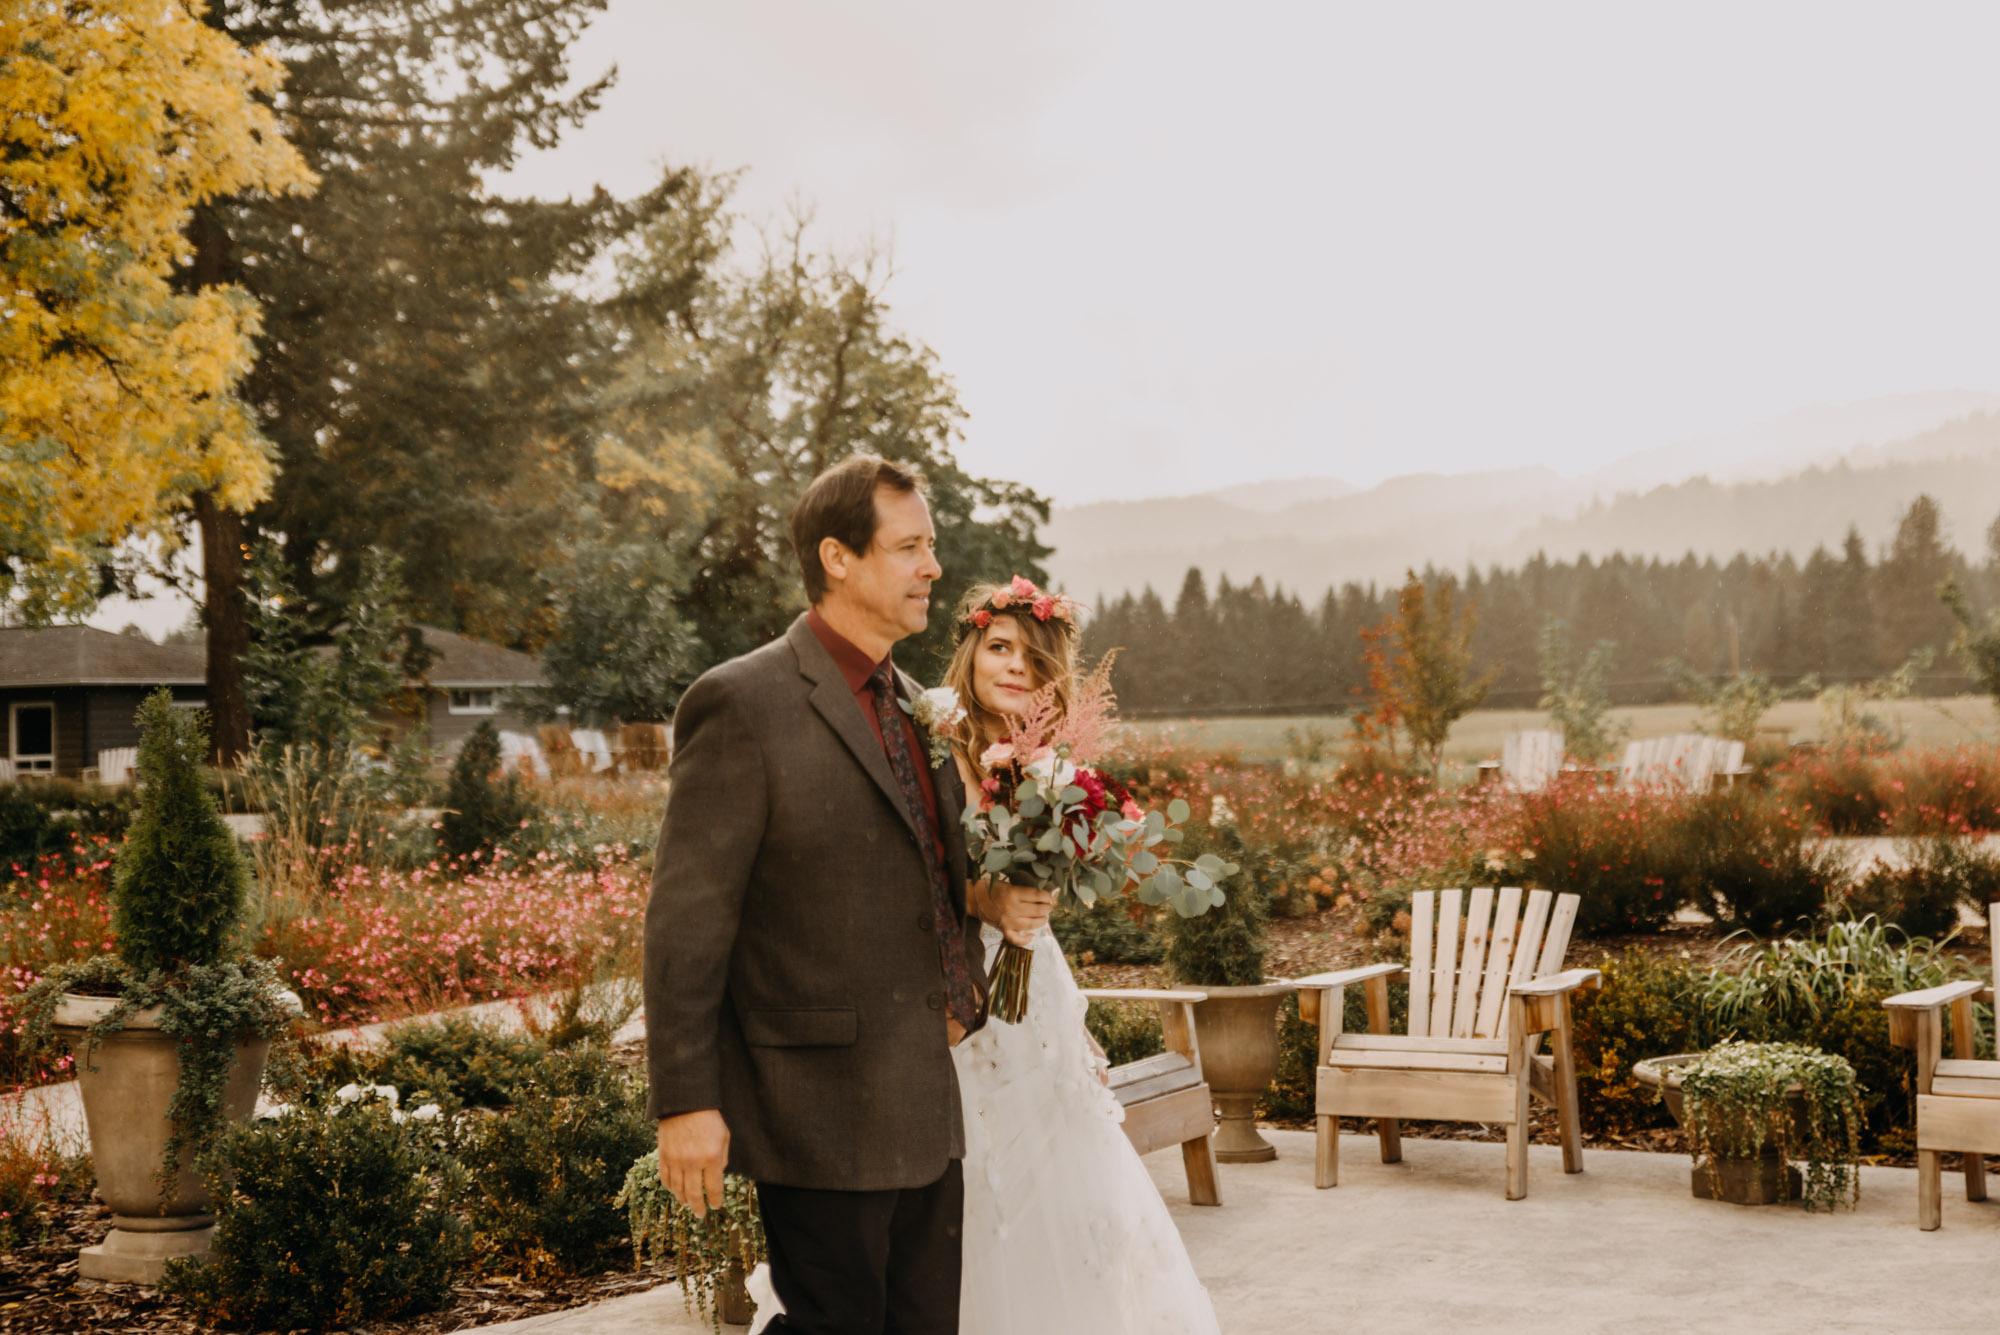 Outdoor-Summer-Ceremony-Washington-Wedding-Rainbow-5346.jpg